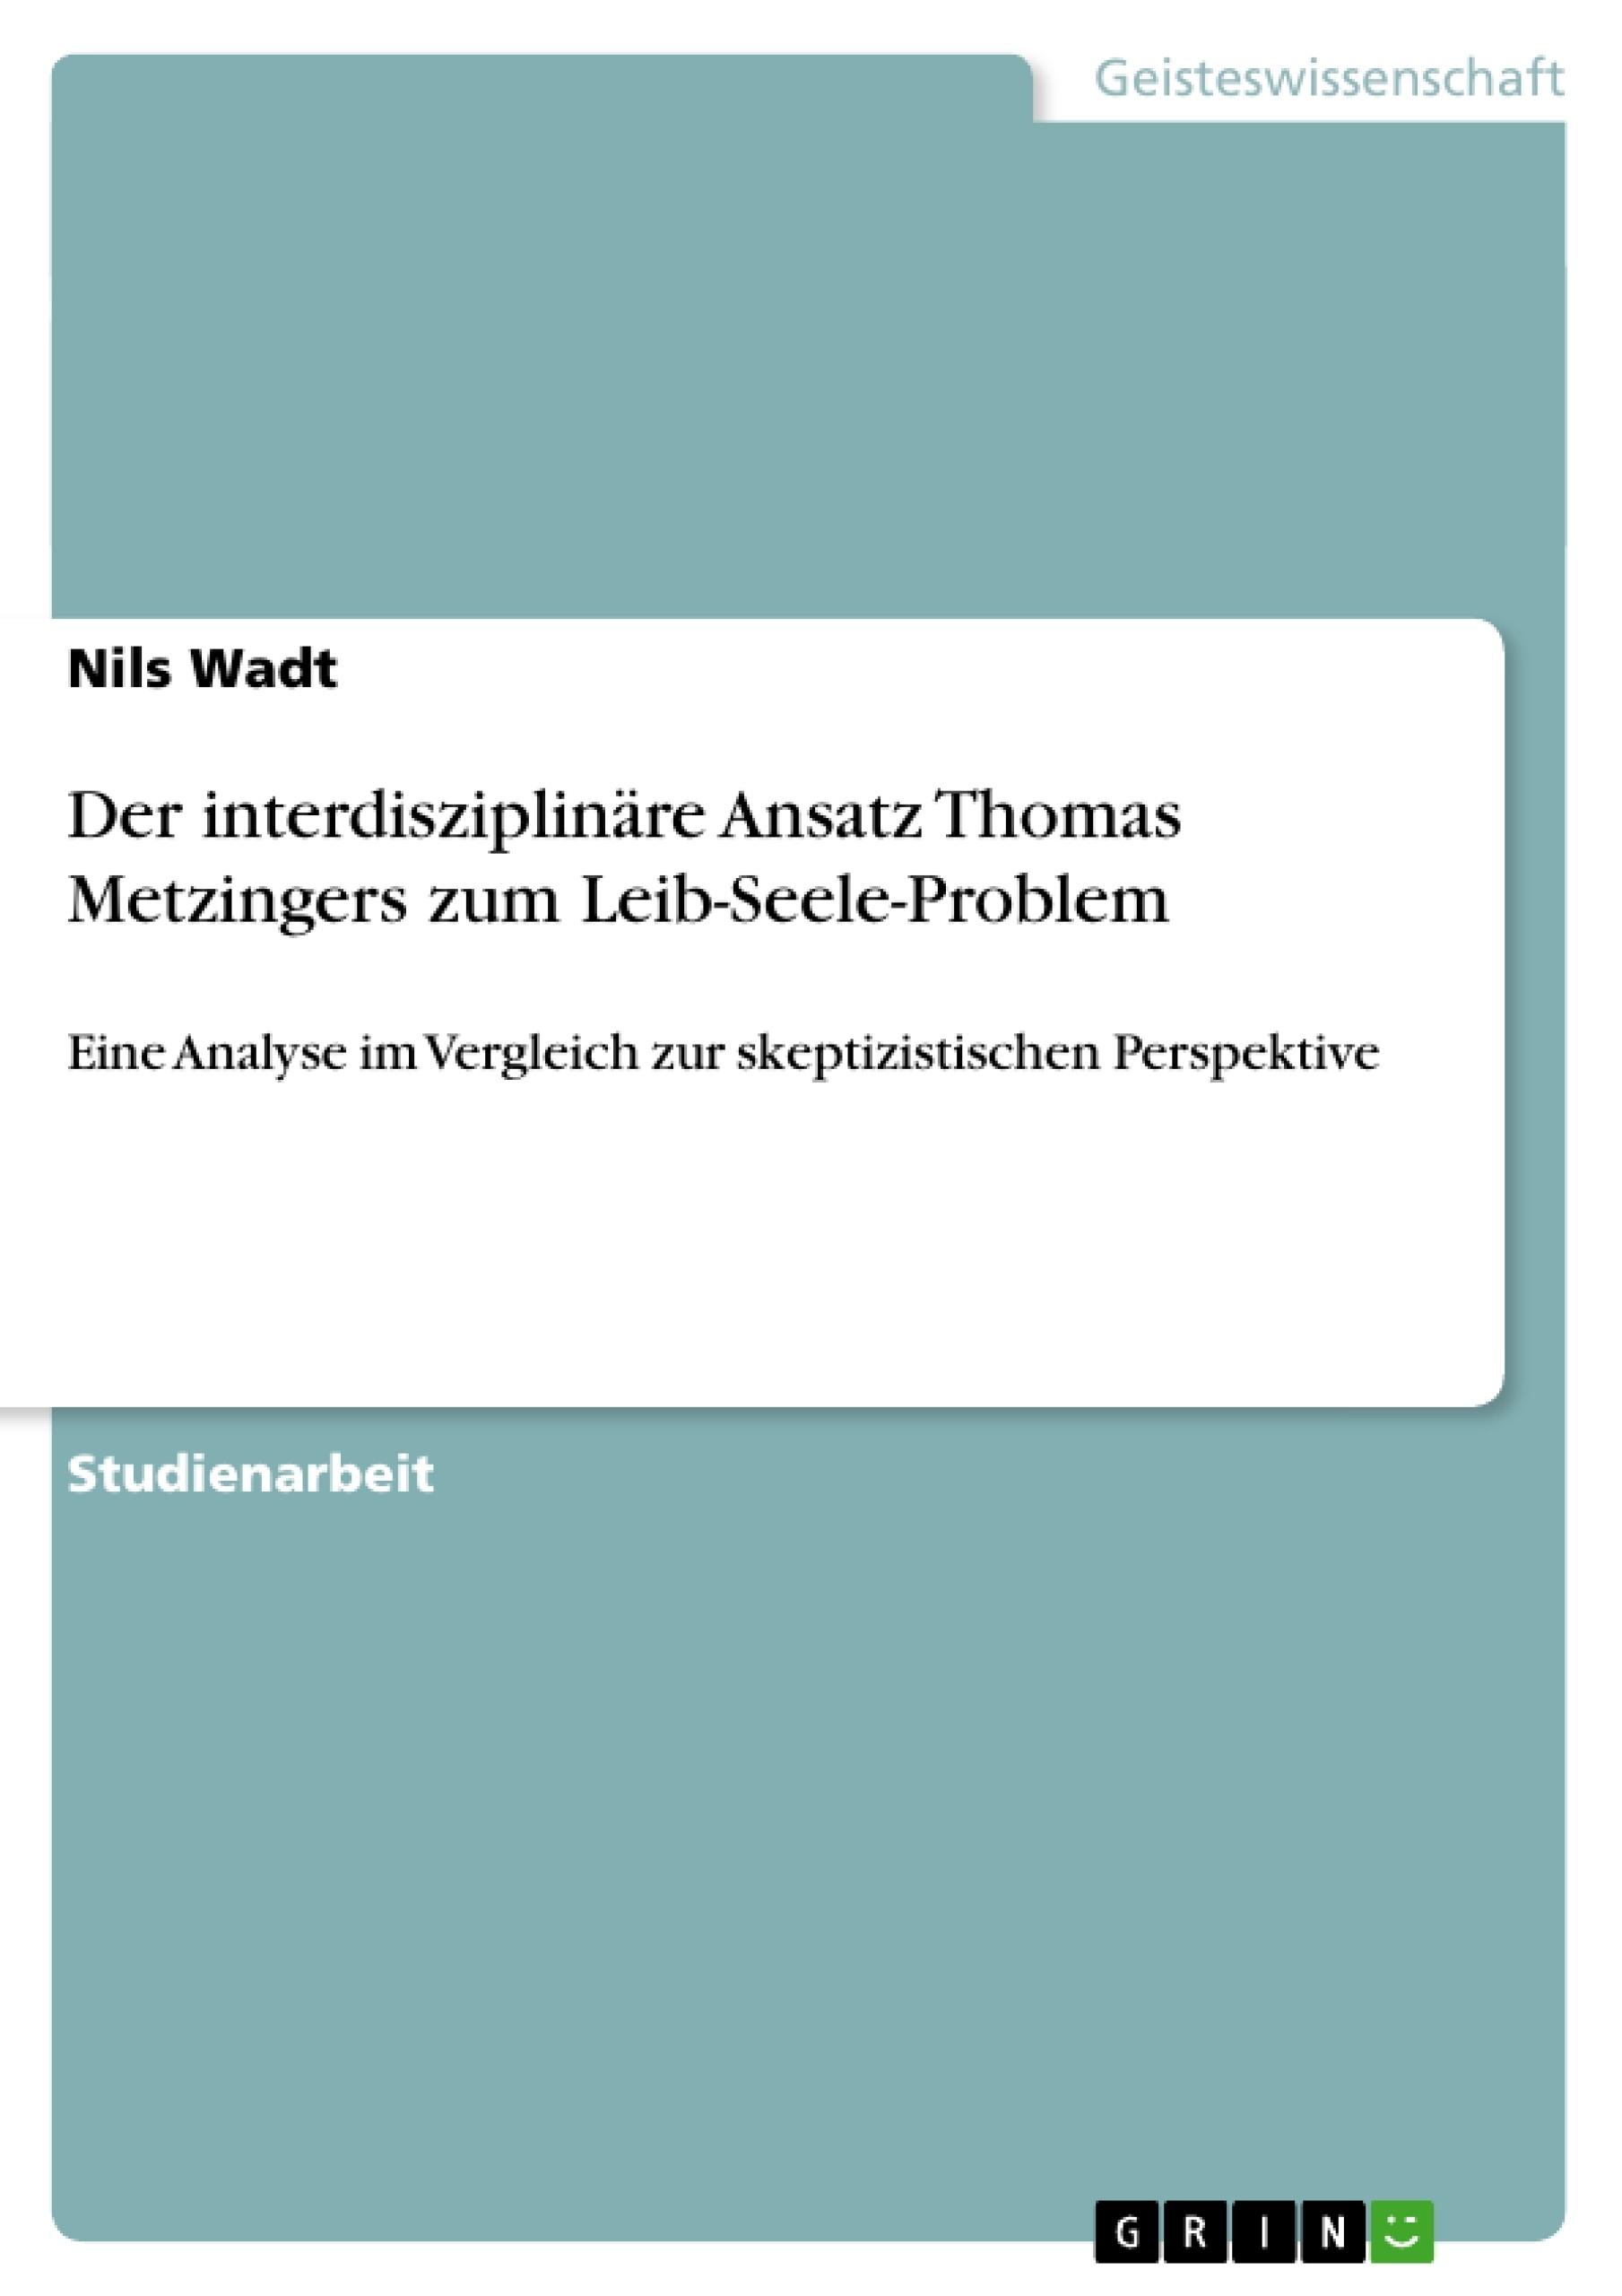 Titel: Der interdisziplinäre Ansatz Thomas Metzingers zum Leib-Seele-Problem